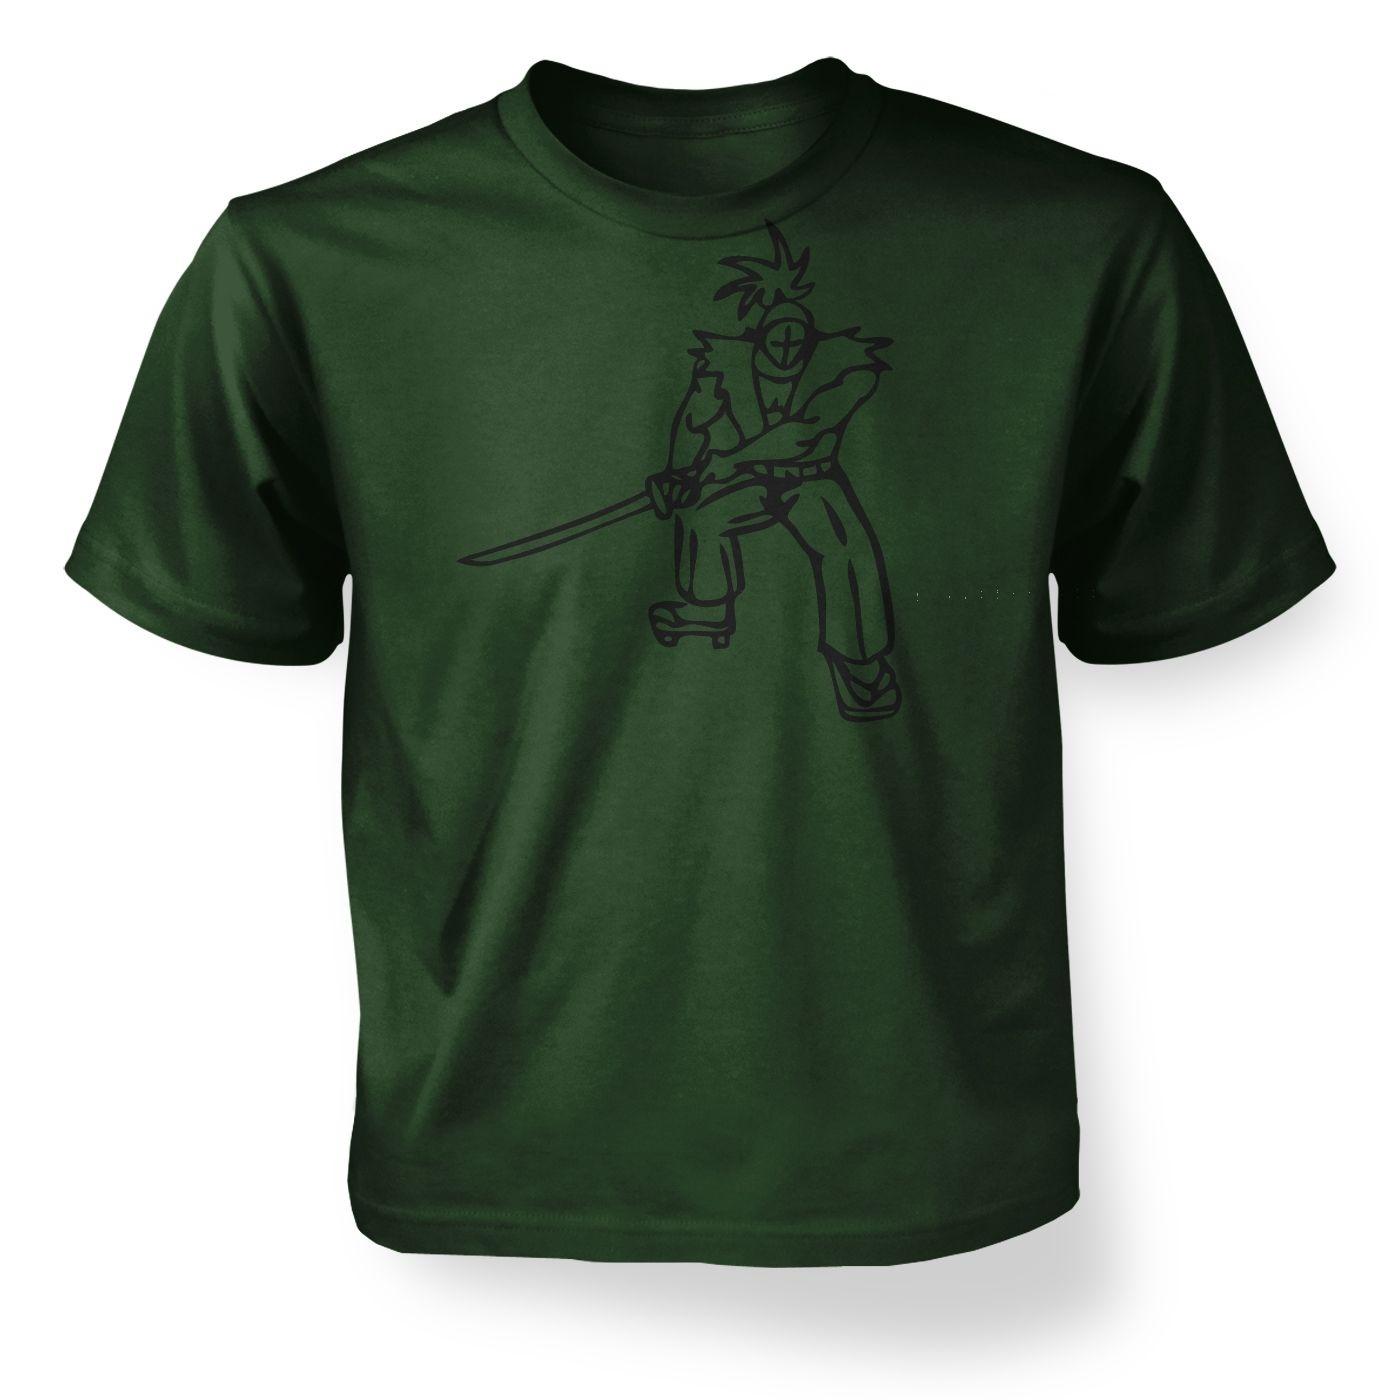 Samurai Ronin Japanese kids' t-shirt